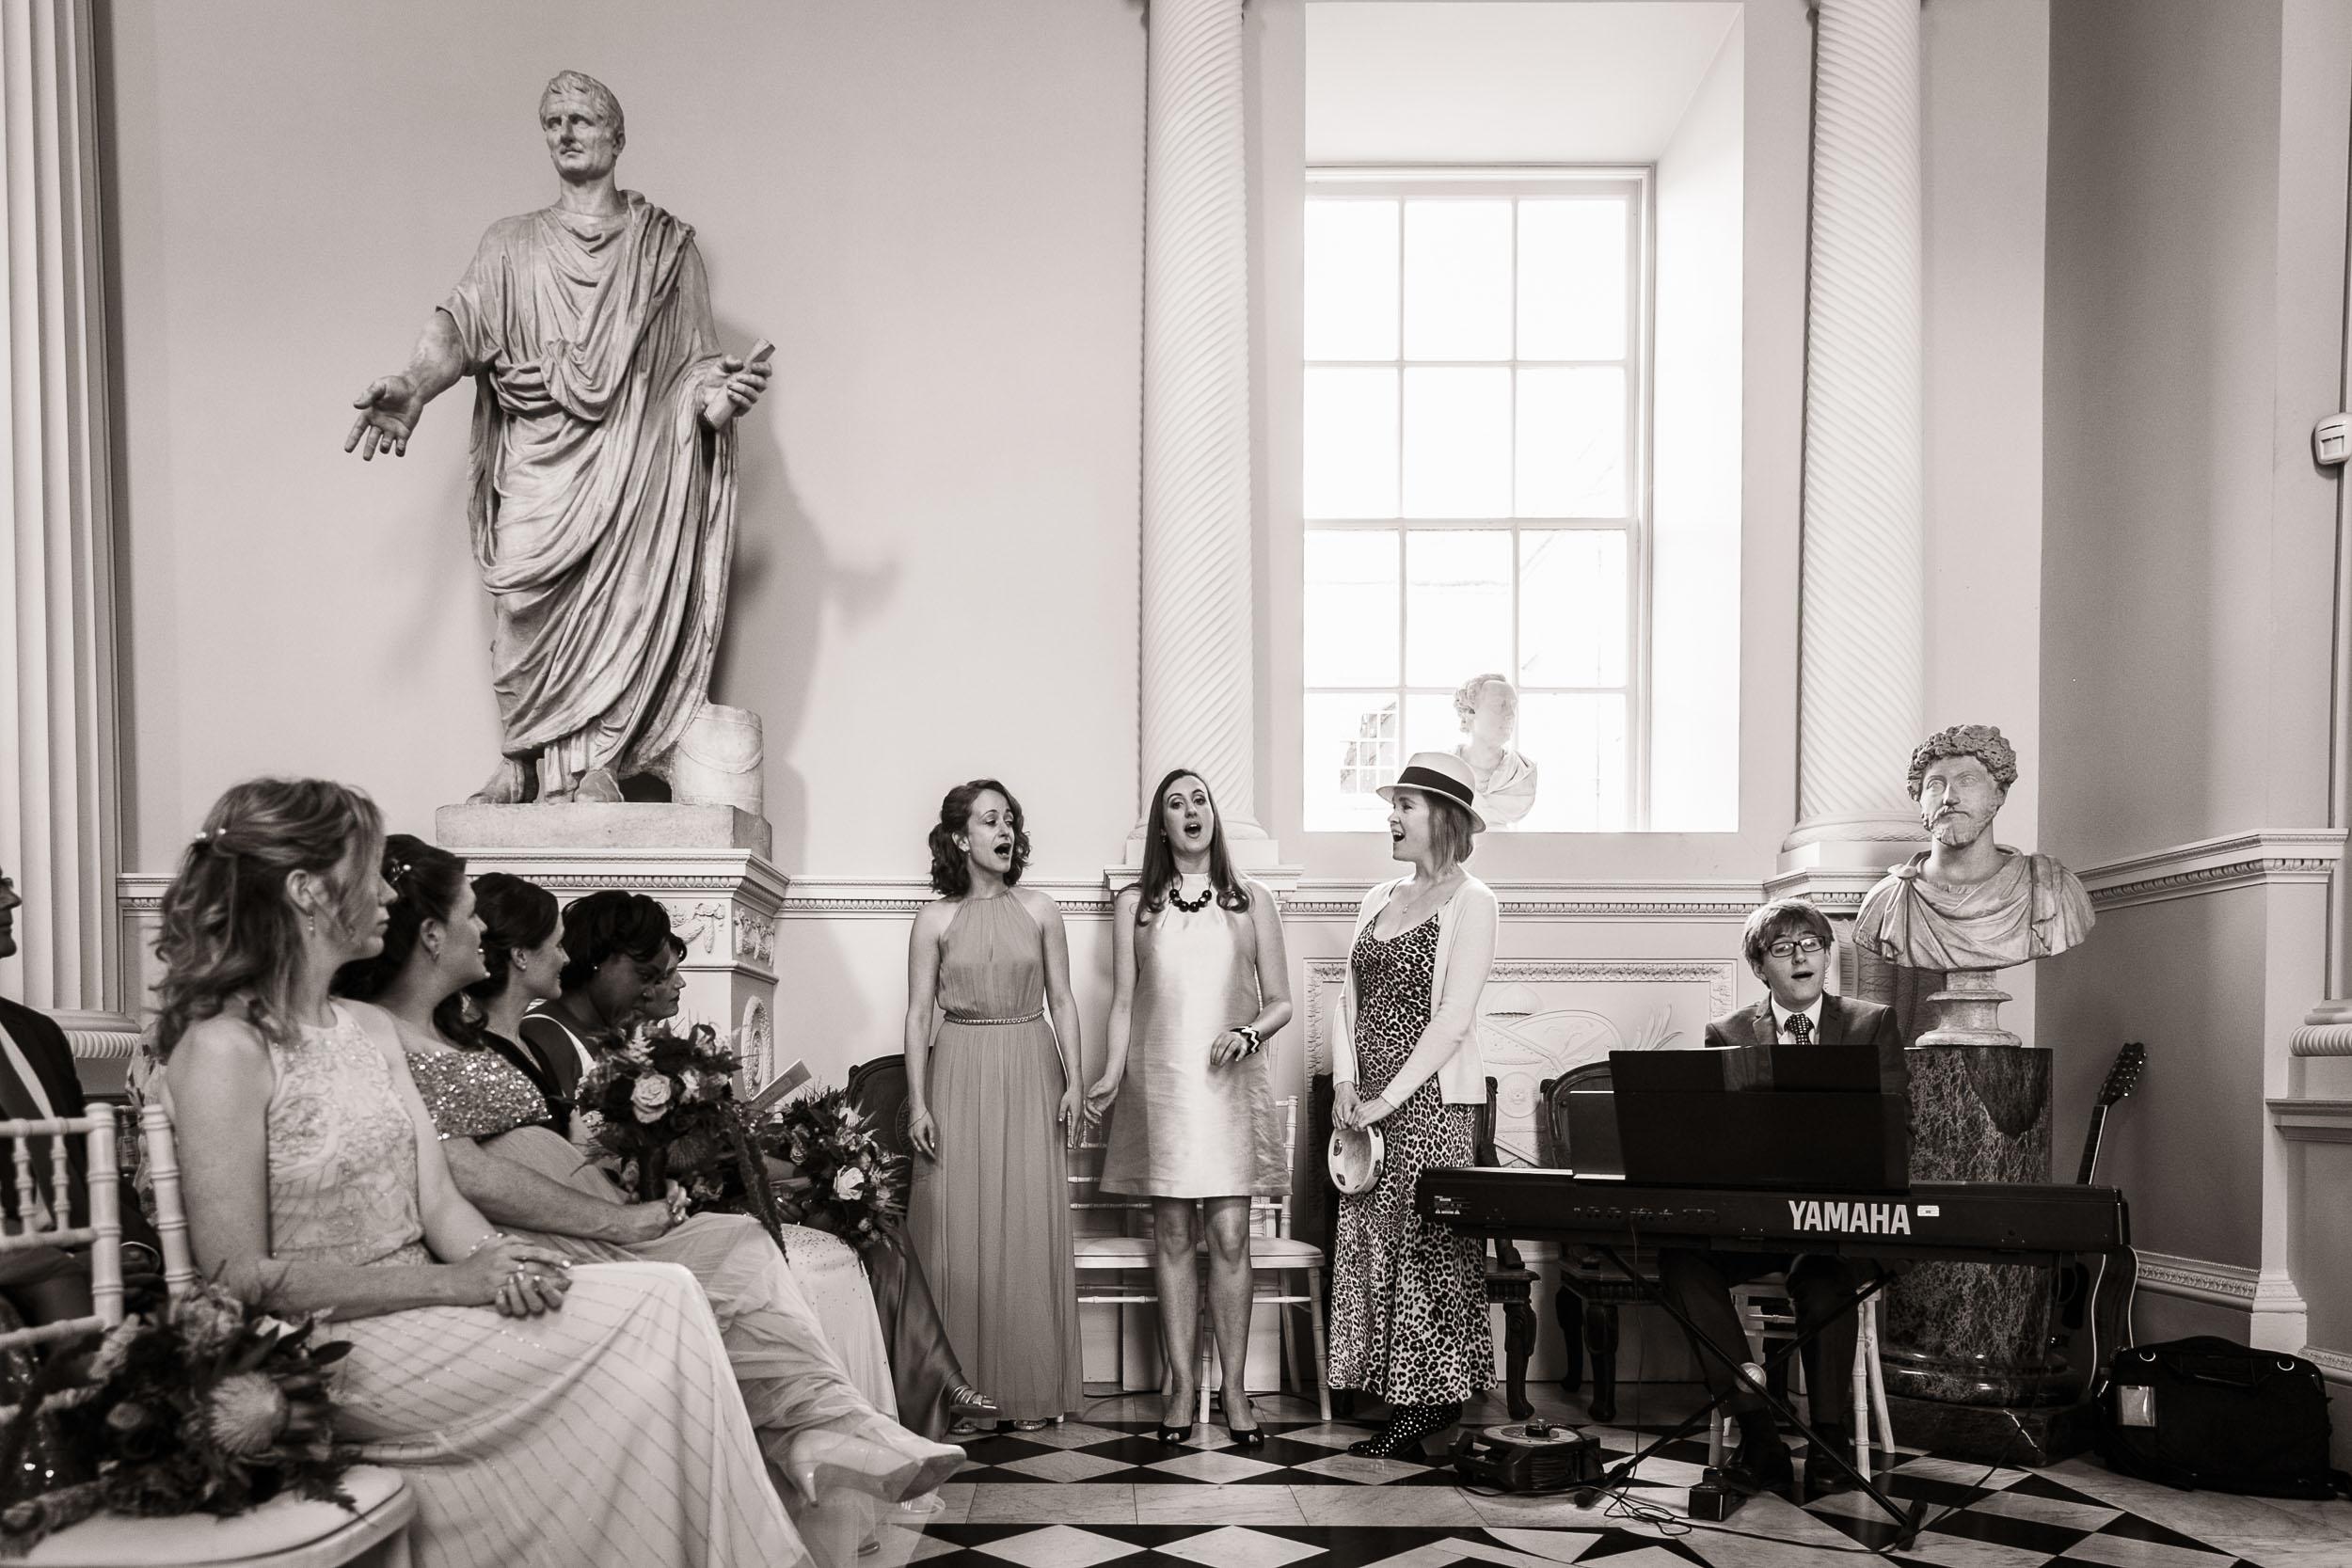 syon-house-wedding-photographer-london 070.jpg